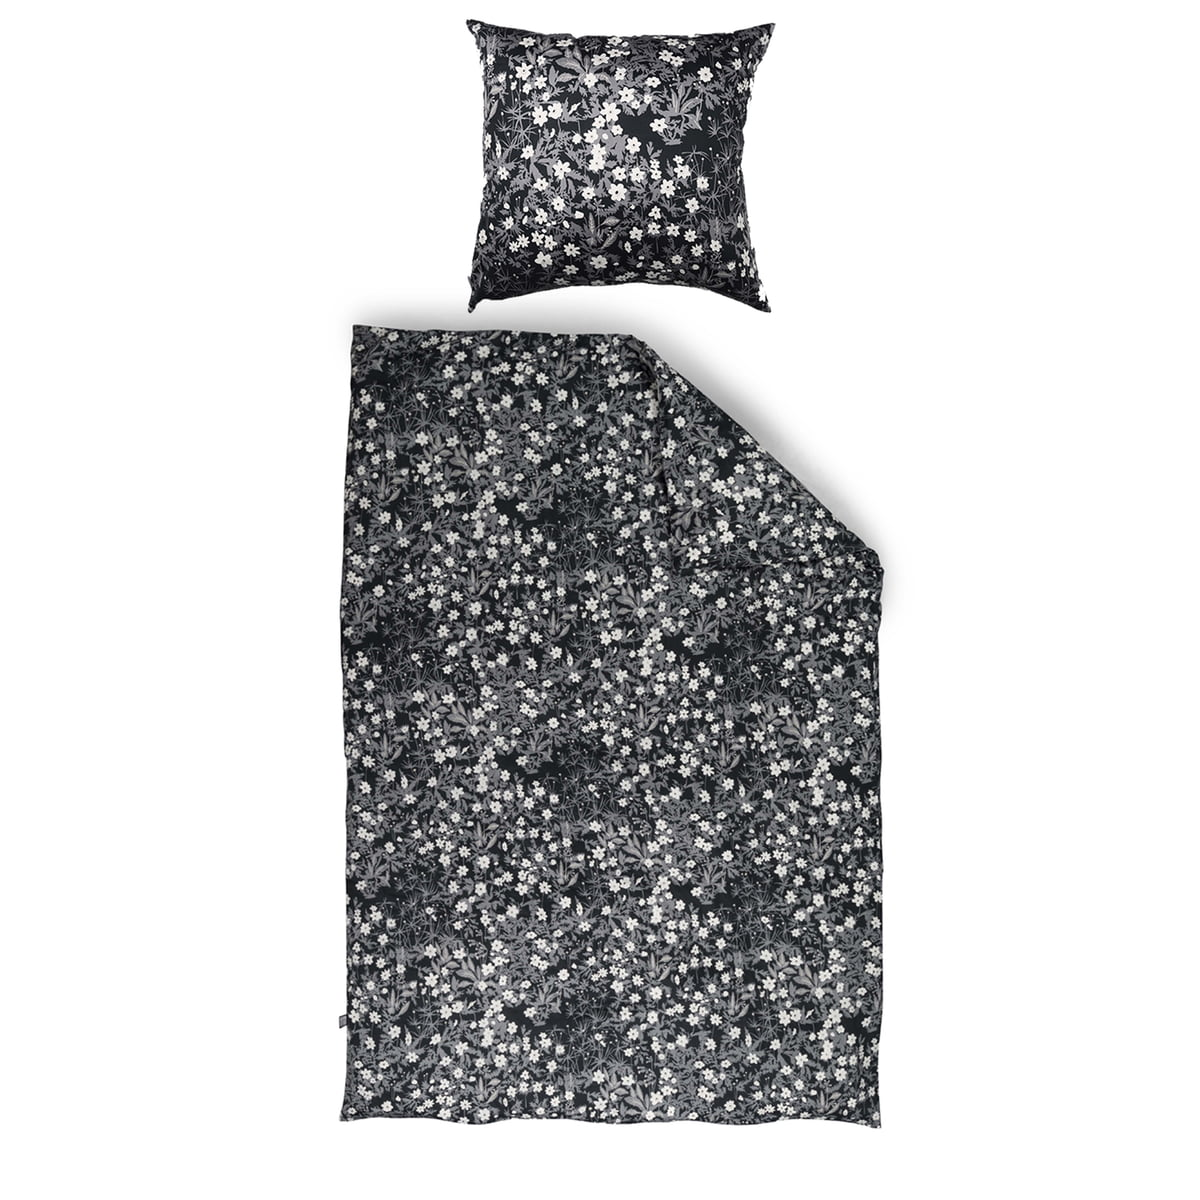 parure lit aj vintage flowers design letters. Black Bedroom Furniture Sets. Home Design Ideas